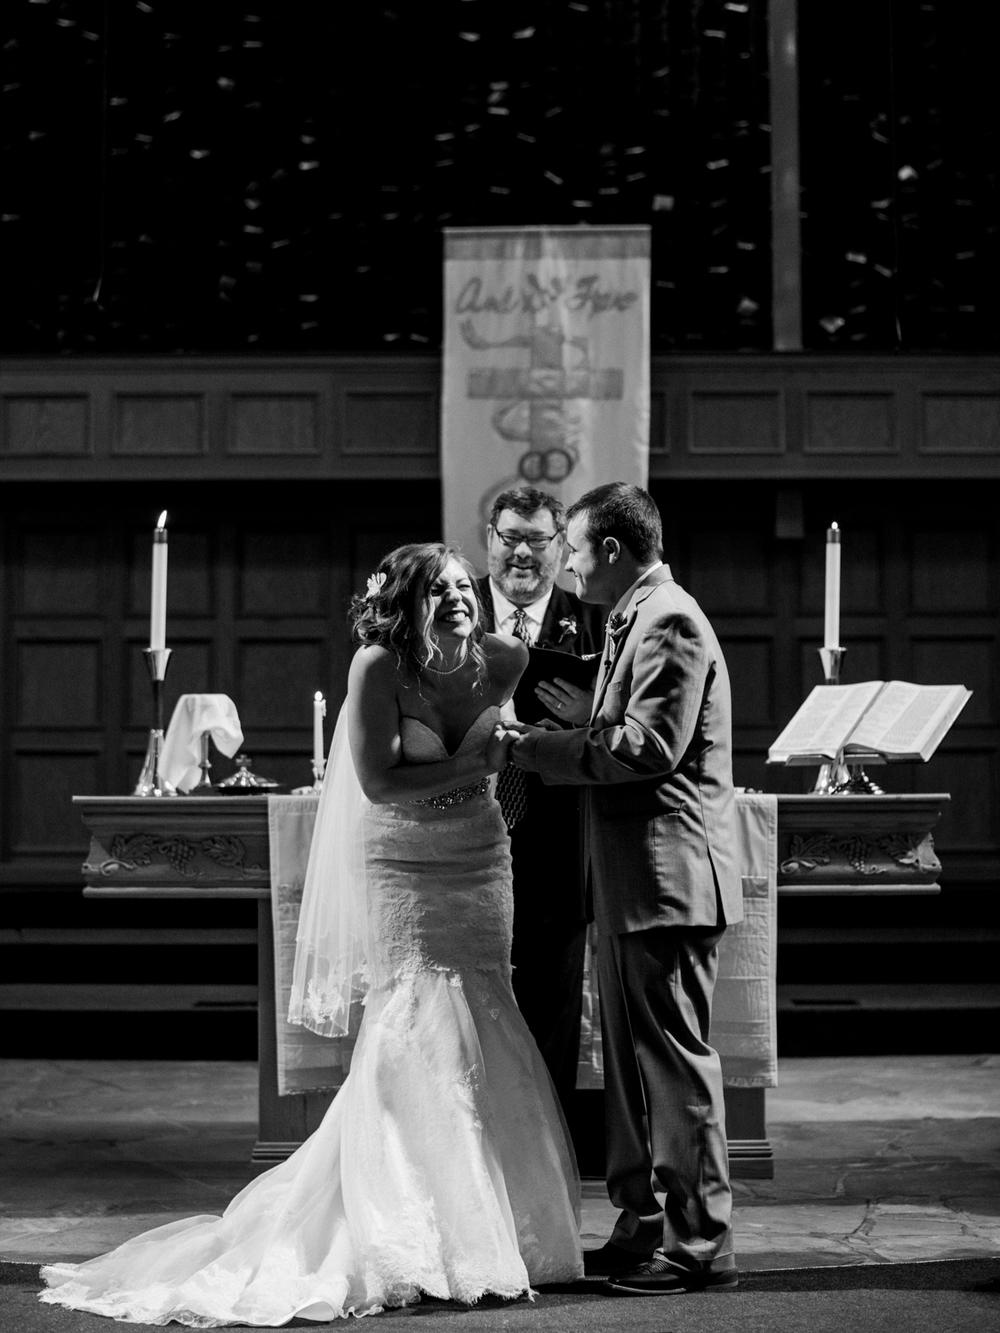 Dodge City, Kansas Wedding-Neal Dieker-Western Kansas Wedding Photographer-Dodge City, Kansas Wedding Photography-Wichita, Kansas Wedding Photographer-258.jpg